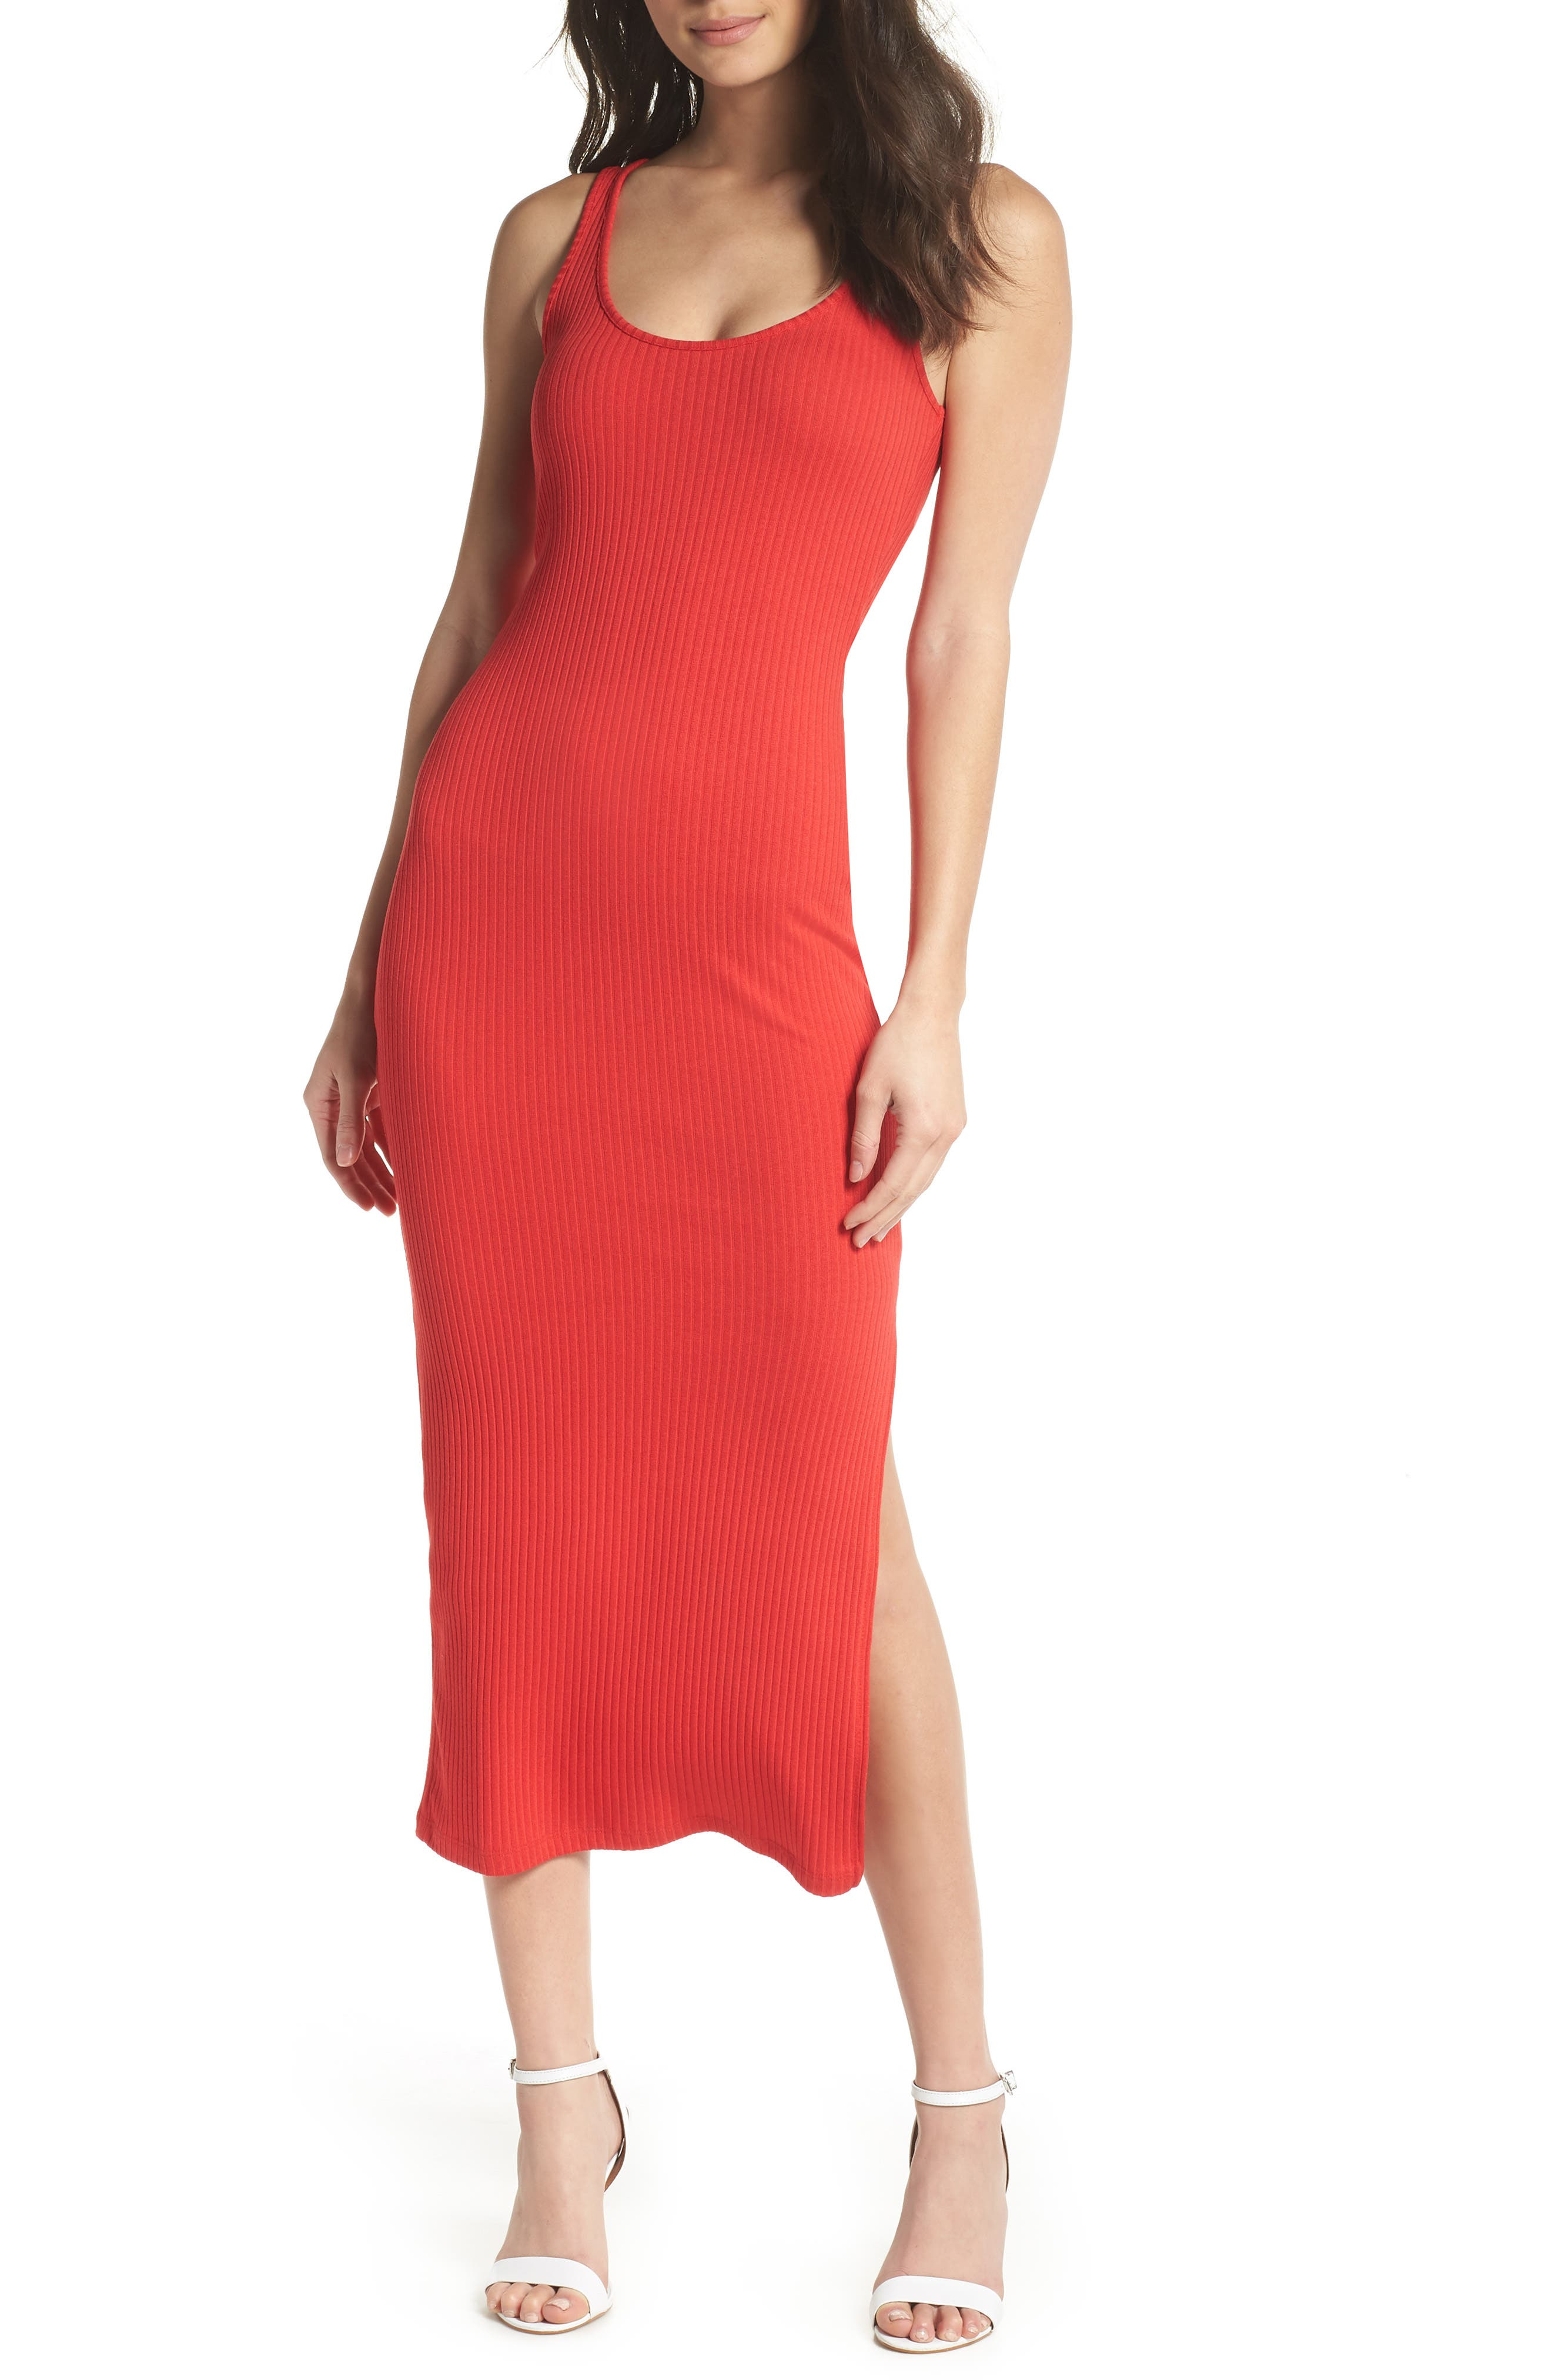 Tommy Rib Knit Tank Dress,                         Main,                         color, SHANGHAI RED